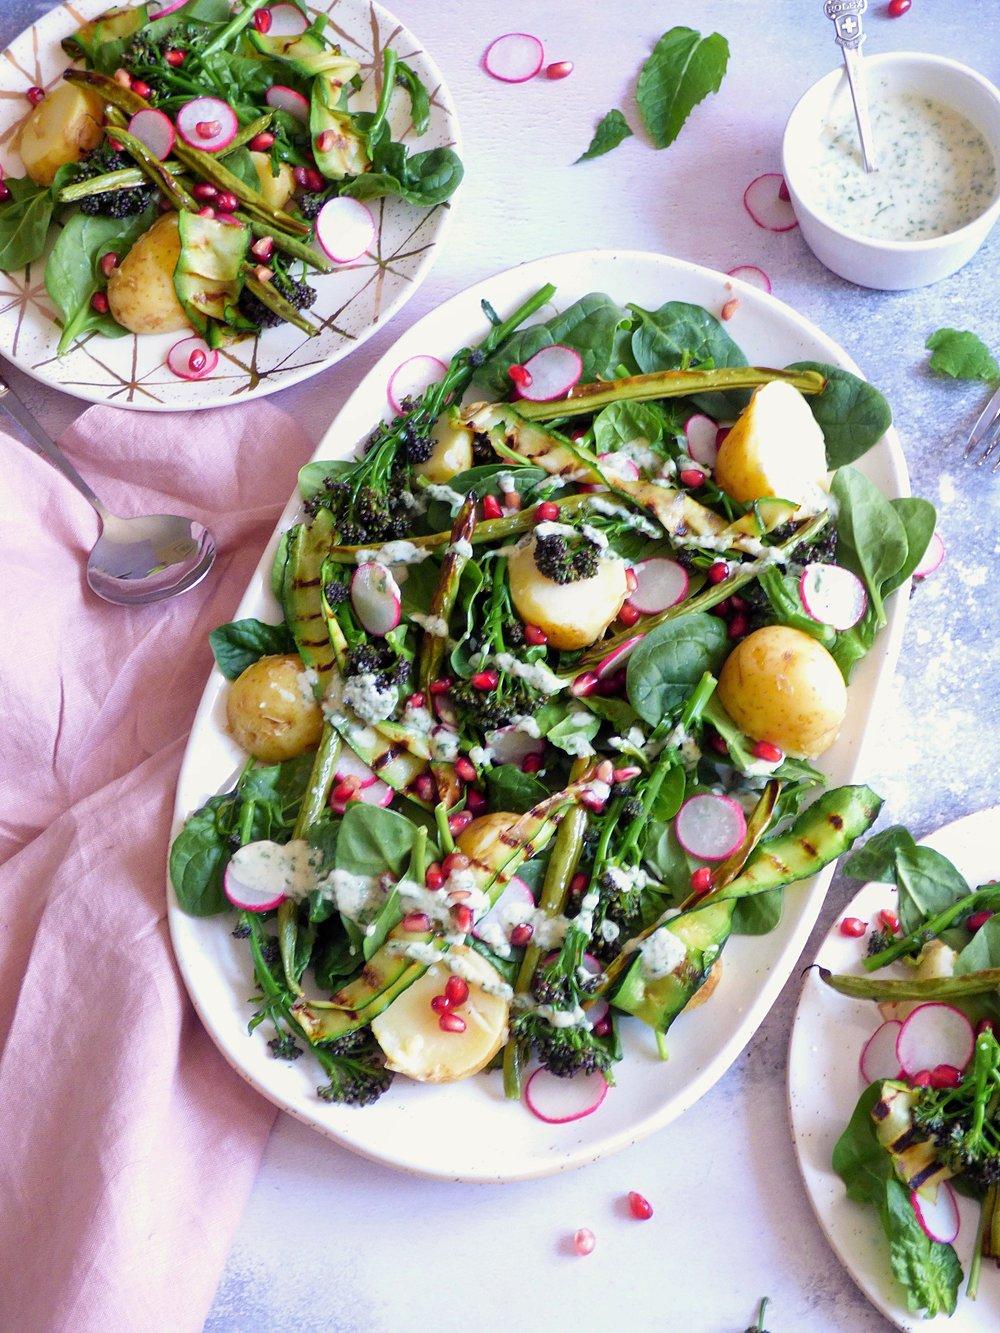 minty salad6.JPG